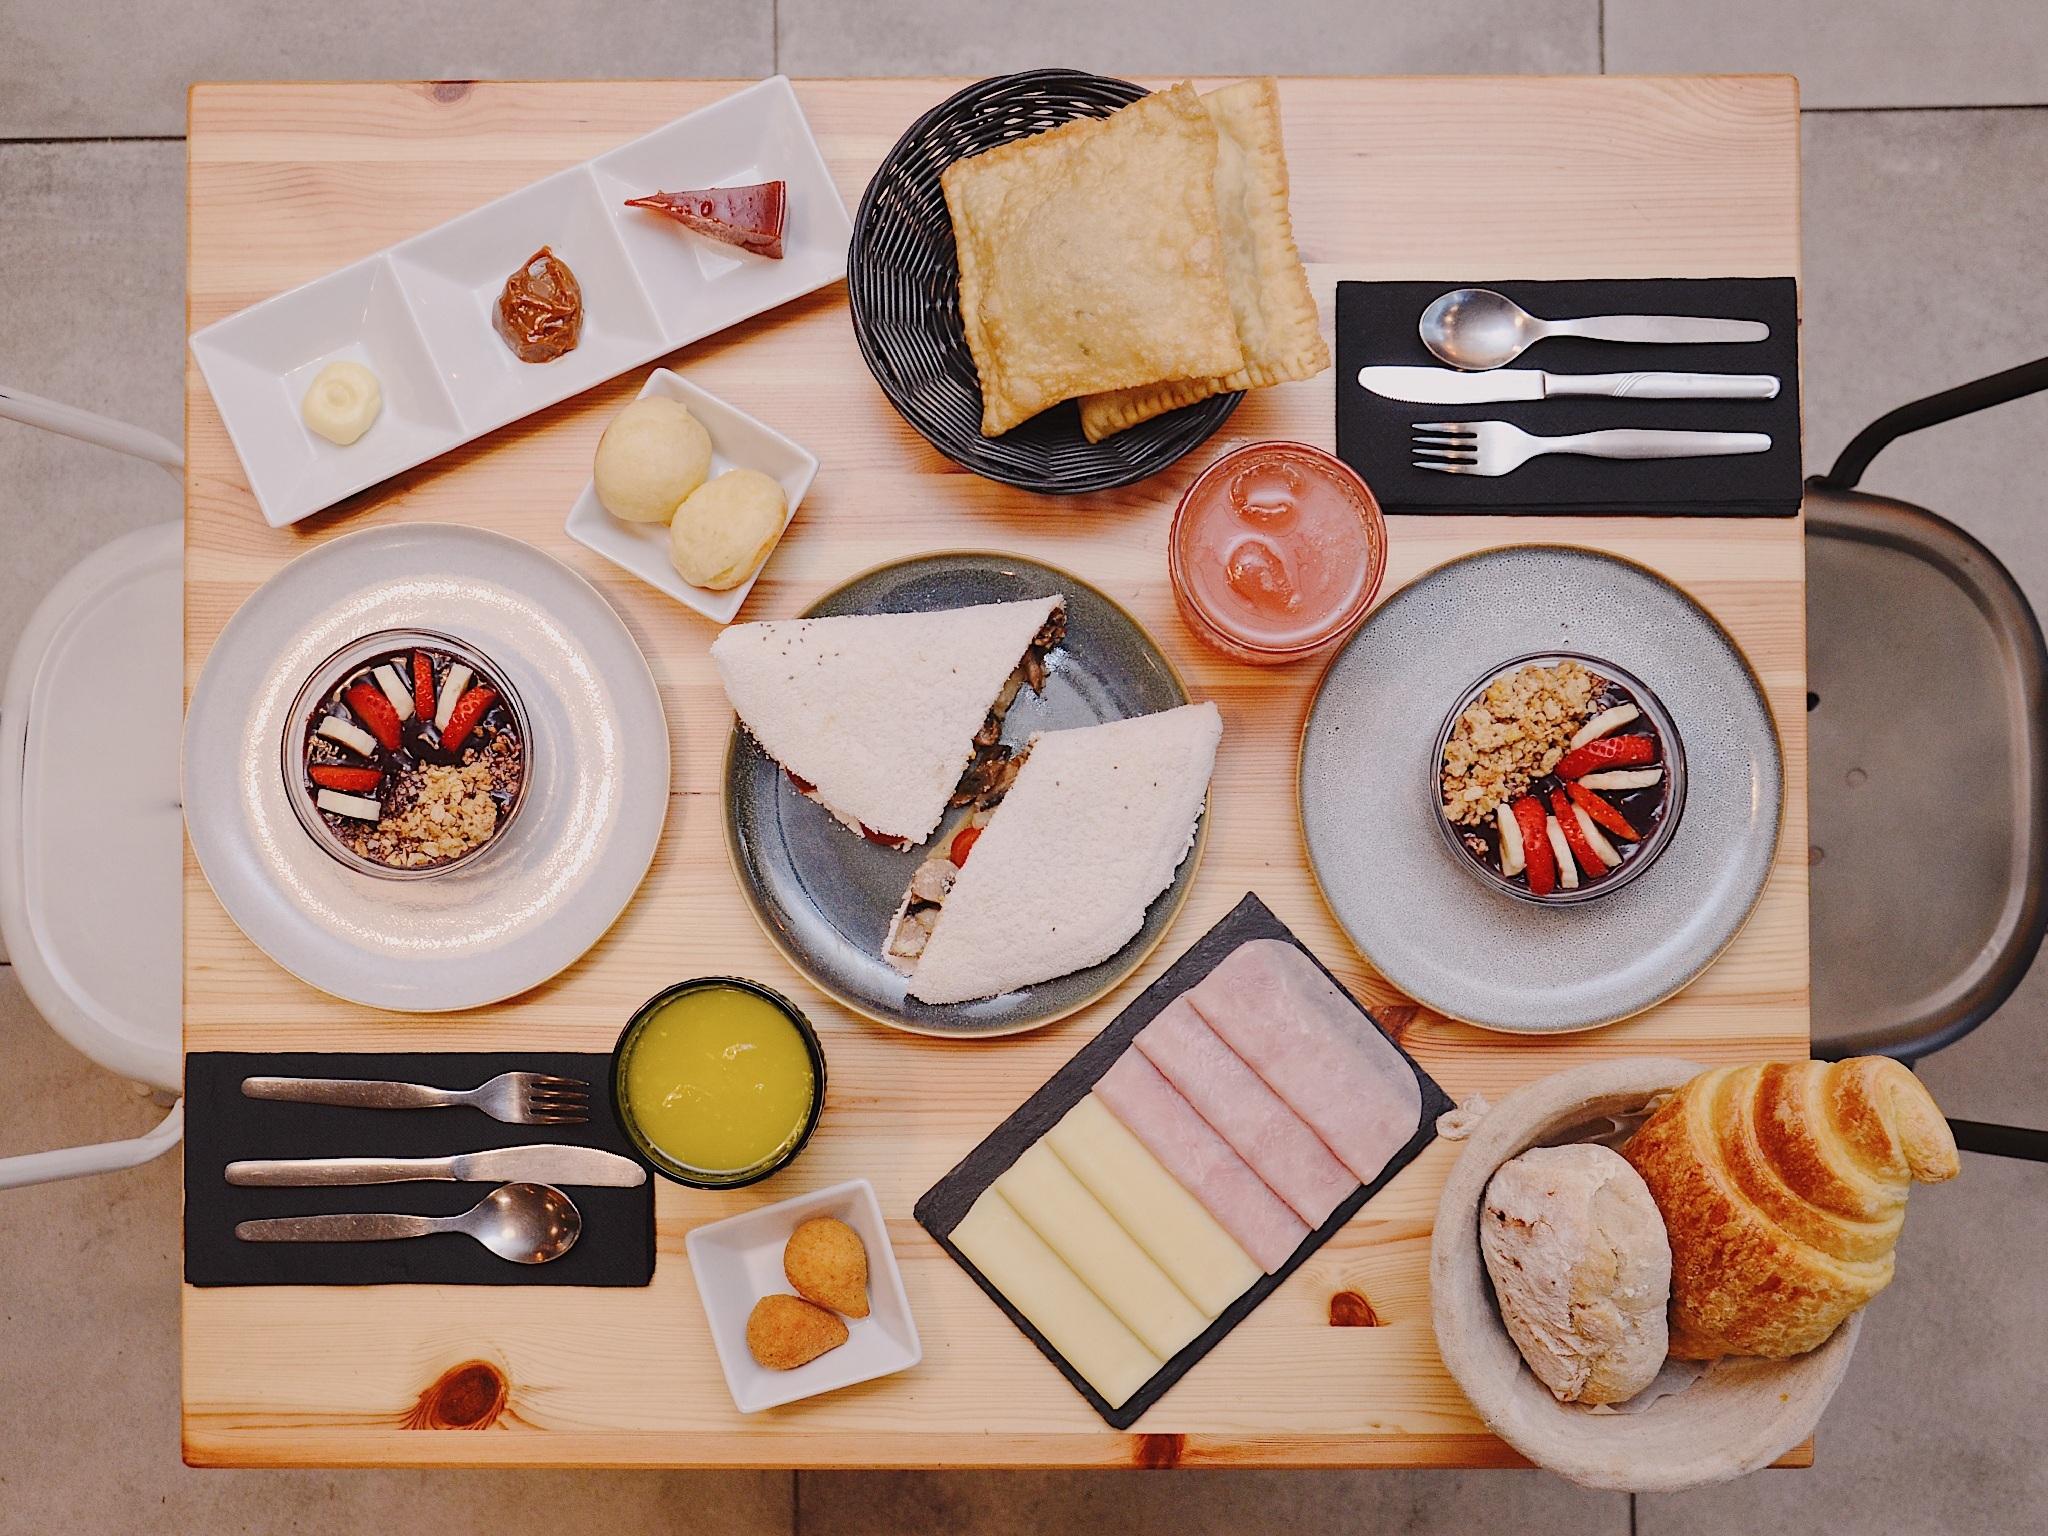 Restaurante, A Lanchonete, Brunch